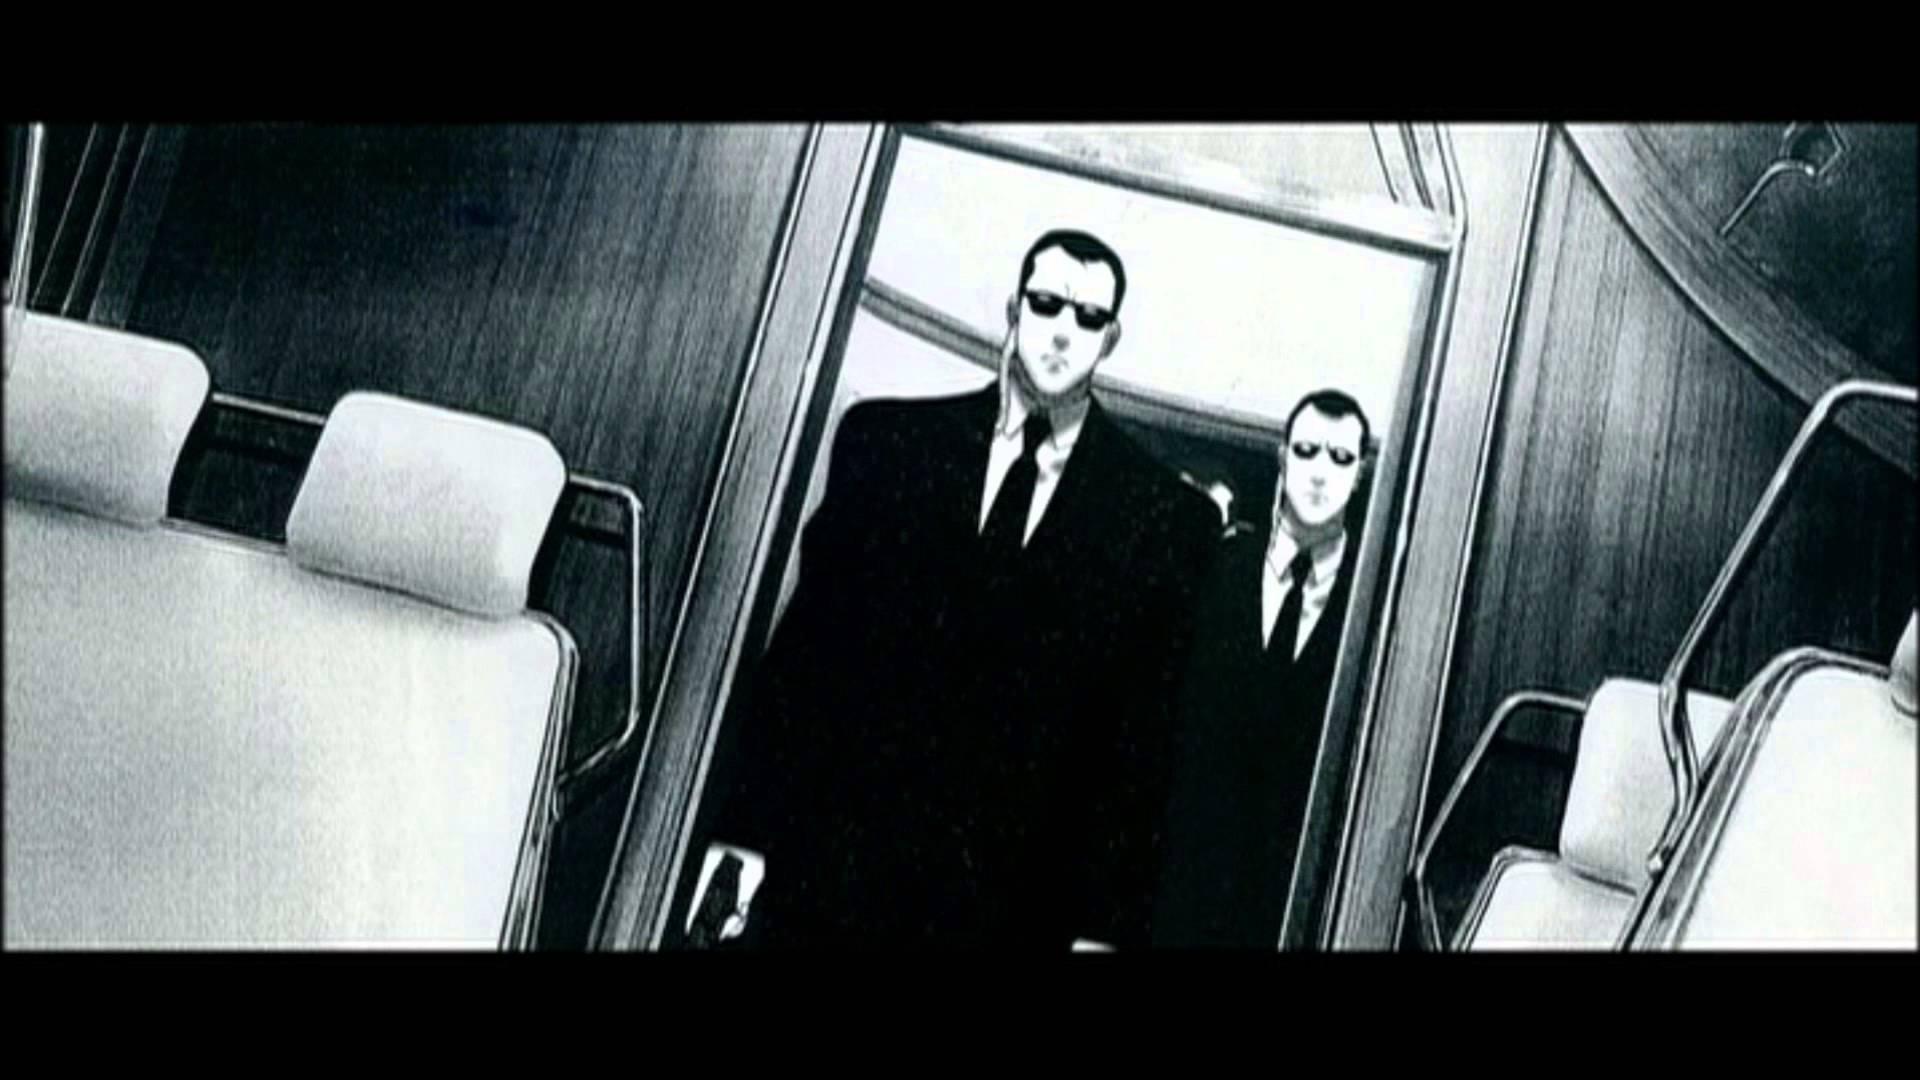 The Animatrix (2003) - Teaser Trailer